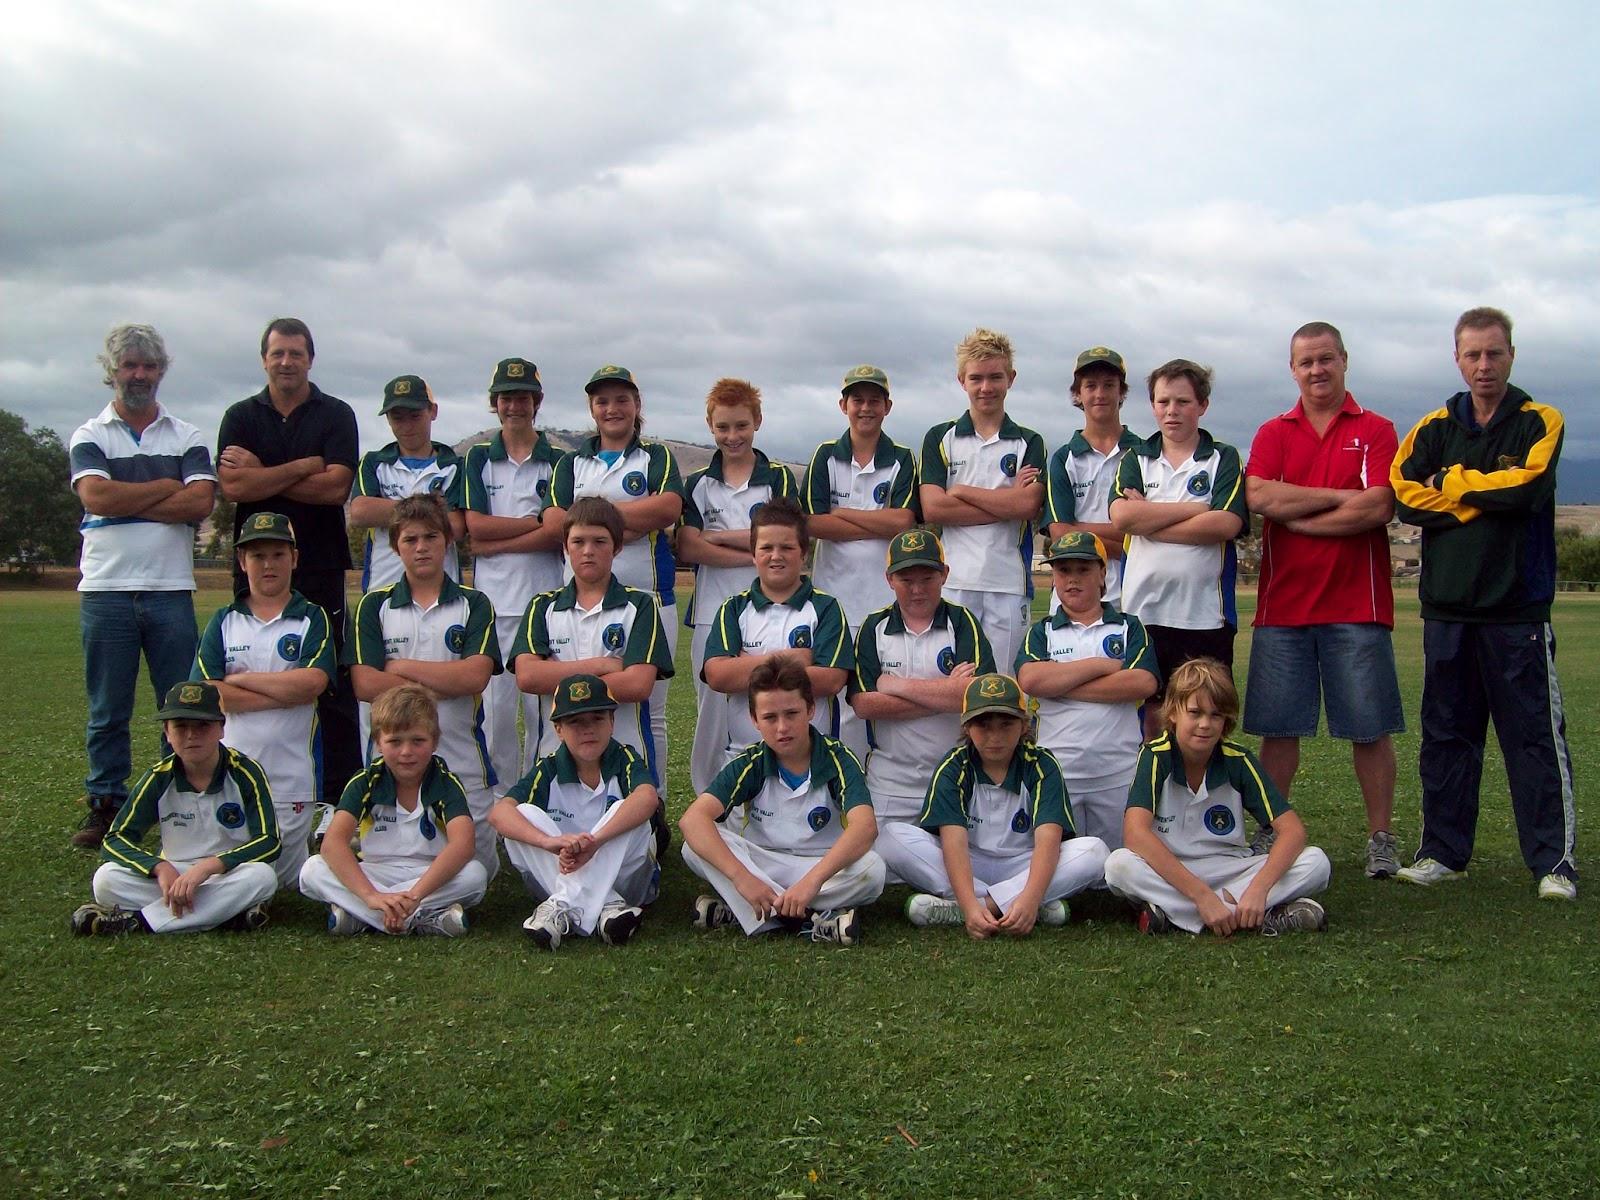 http://2.bp.blogspot.com/-mtggiWiSb7Y/T2cdo3B26ZI/AAAAAAAAB_w/doemNgUcemc/s1600/Gretna+Cricket+Club+Under+13\'s+2011-12.jpg